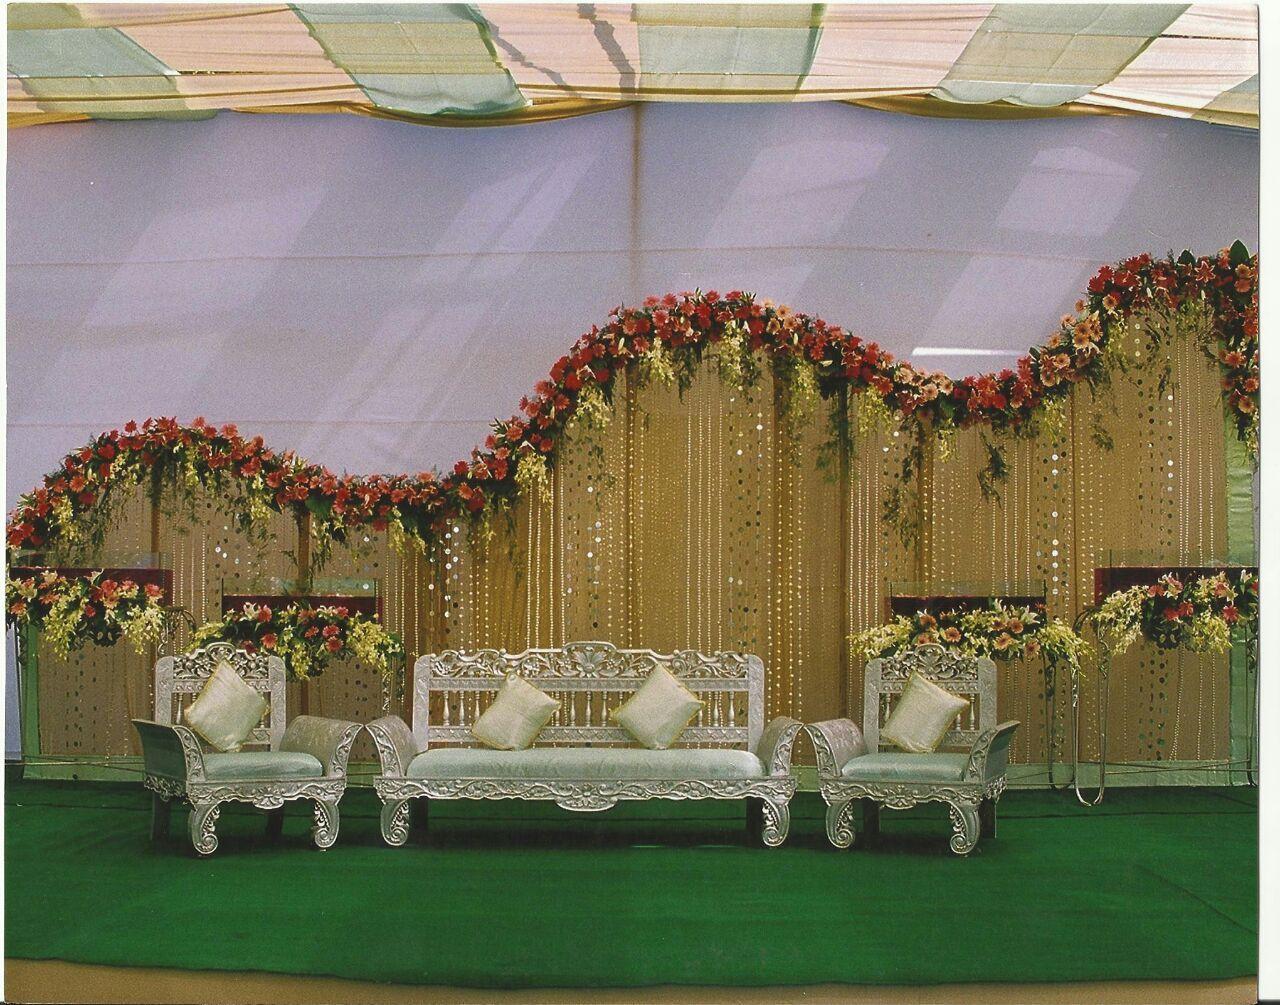 Wedding stage decoration dubai  Gallery   Stage Decoration  Stage Decoration By DX Events